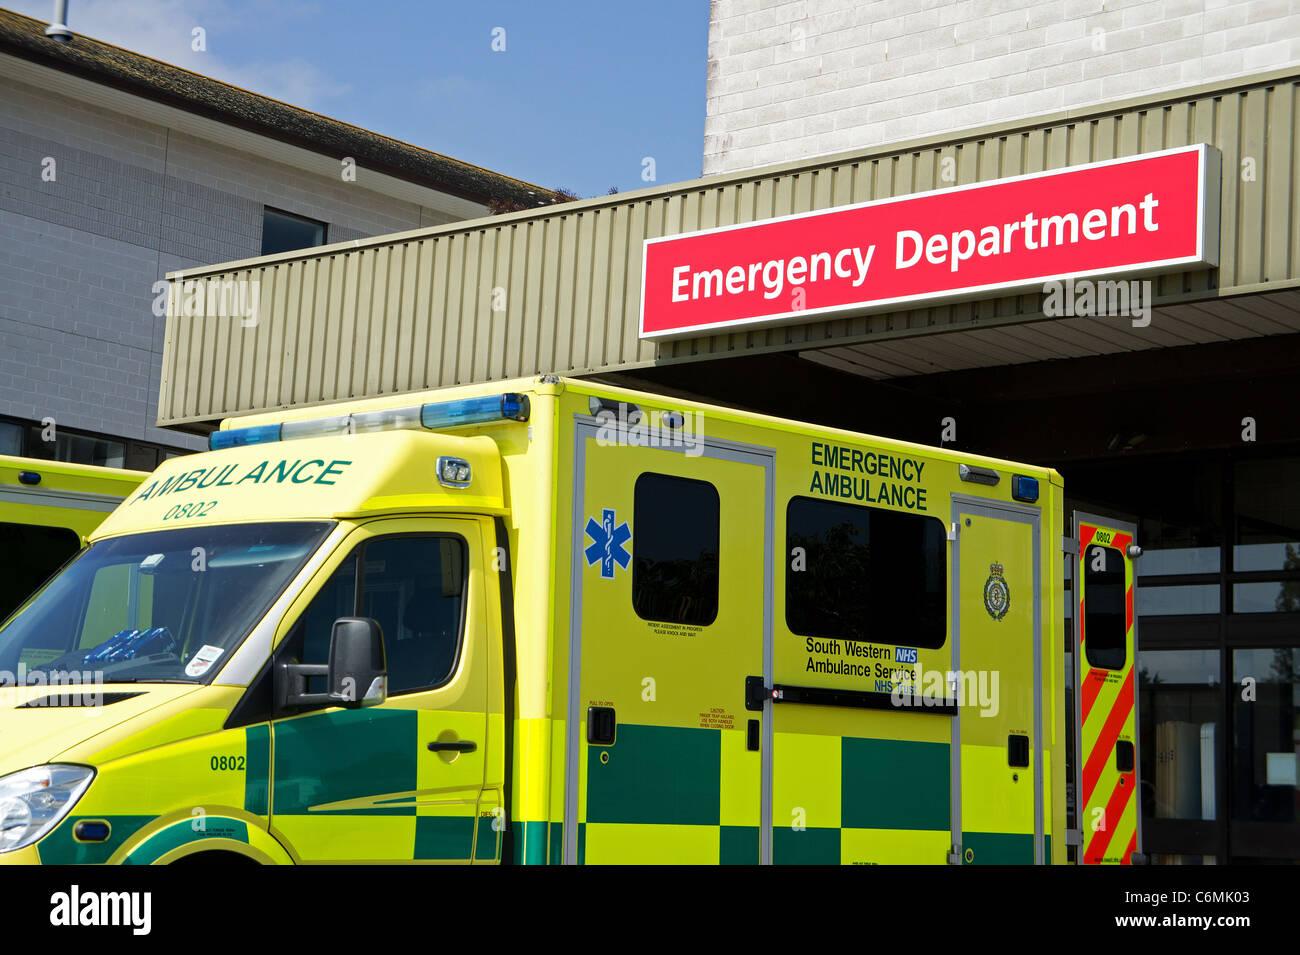 Une ambulance en dehors de l'accident et d'urgence de l'hôpital royal de cornouailles, Truro, Cornwall, Photo Stock